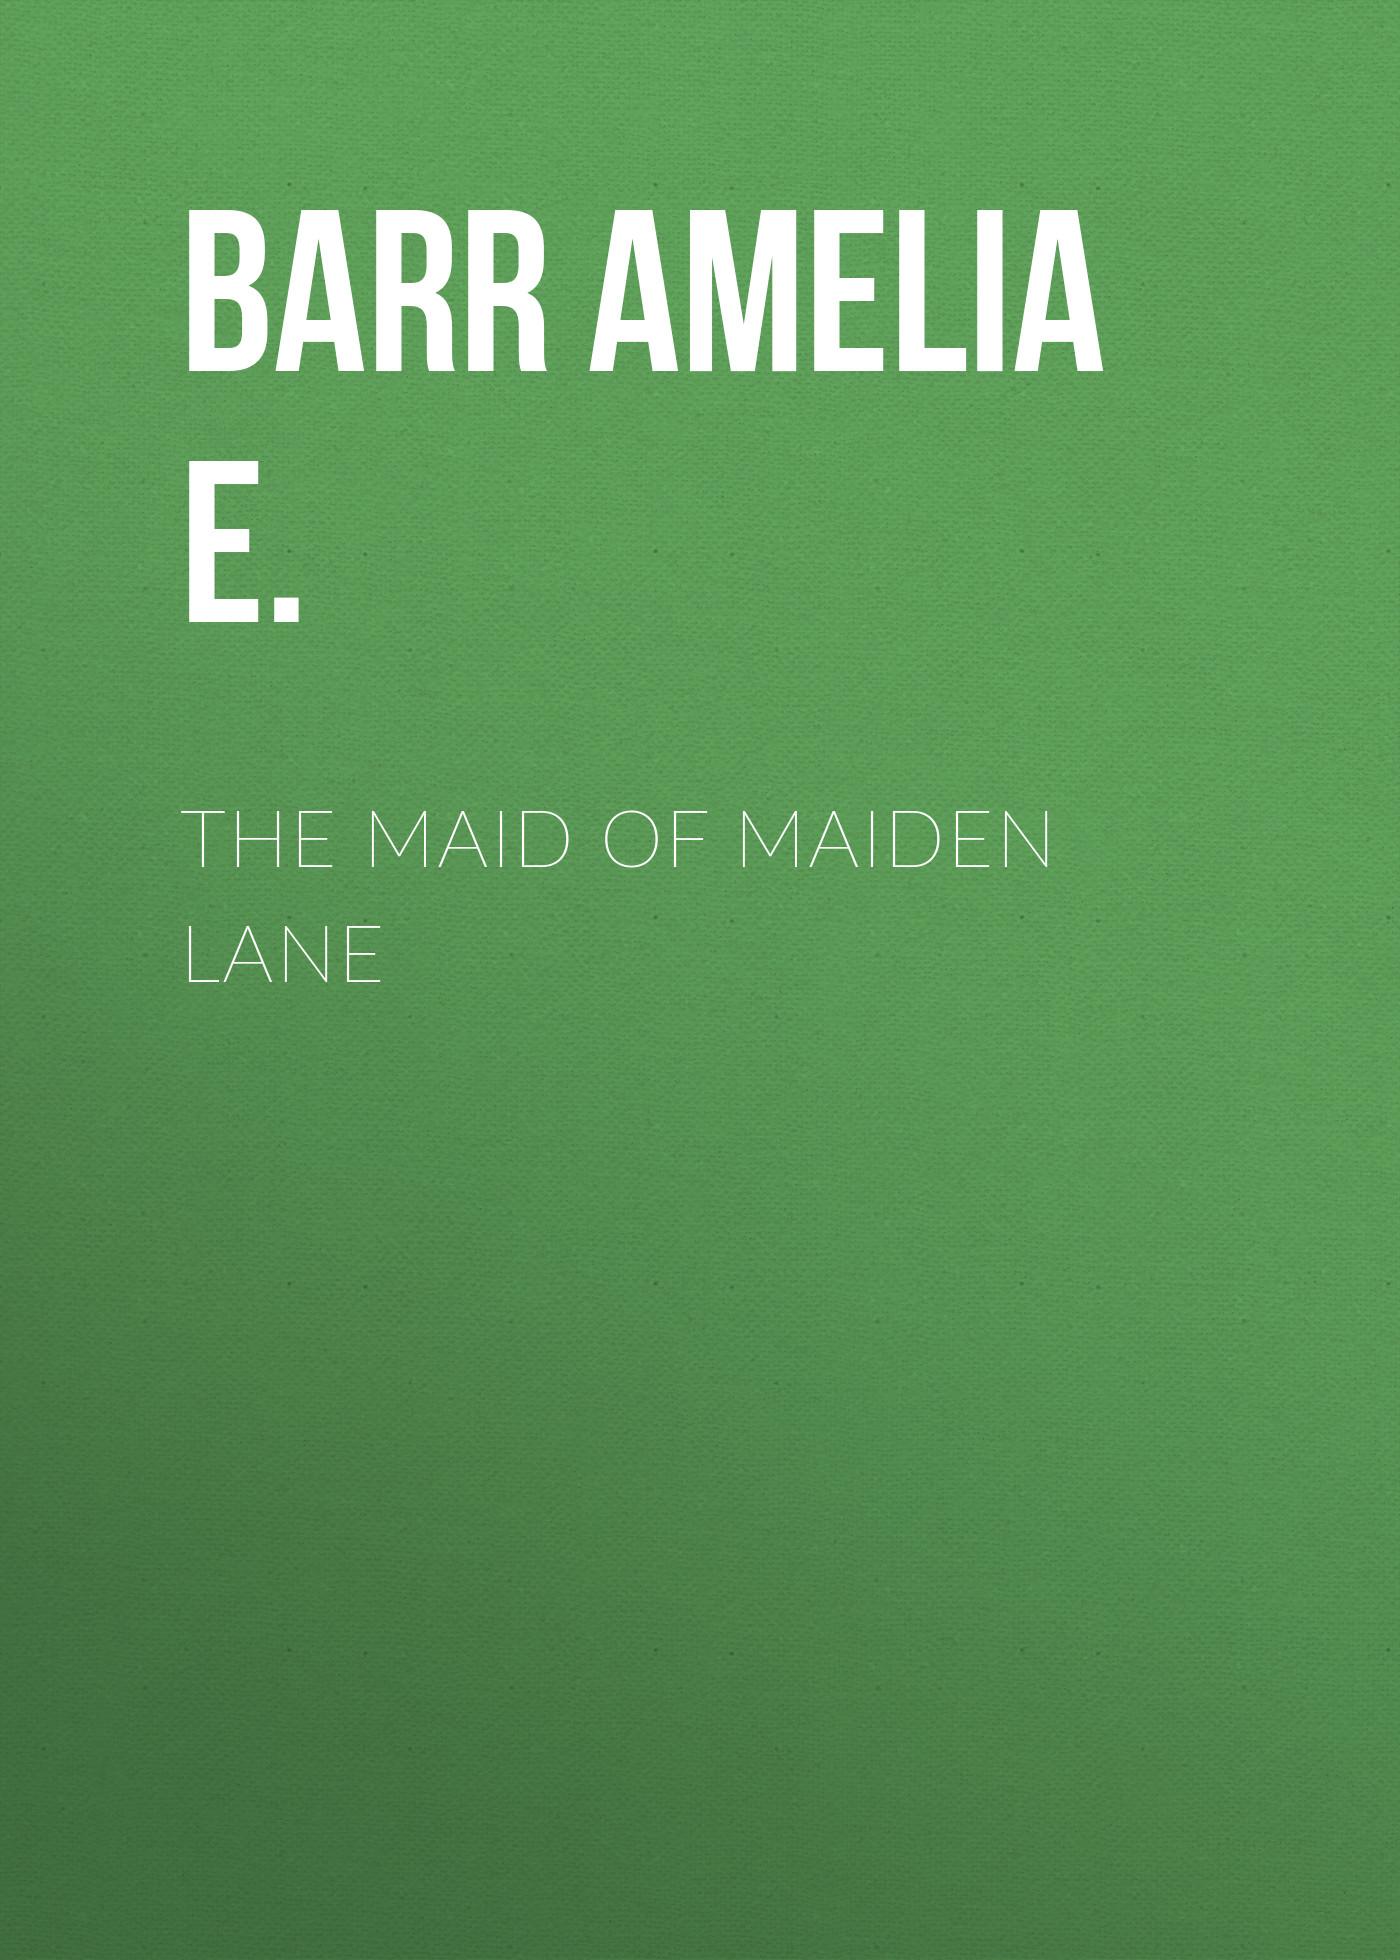 Barr Amelia E. The Maid of Maiden Lane